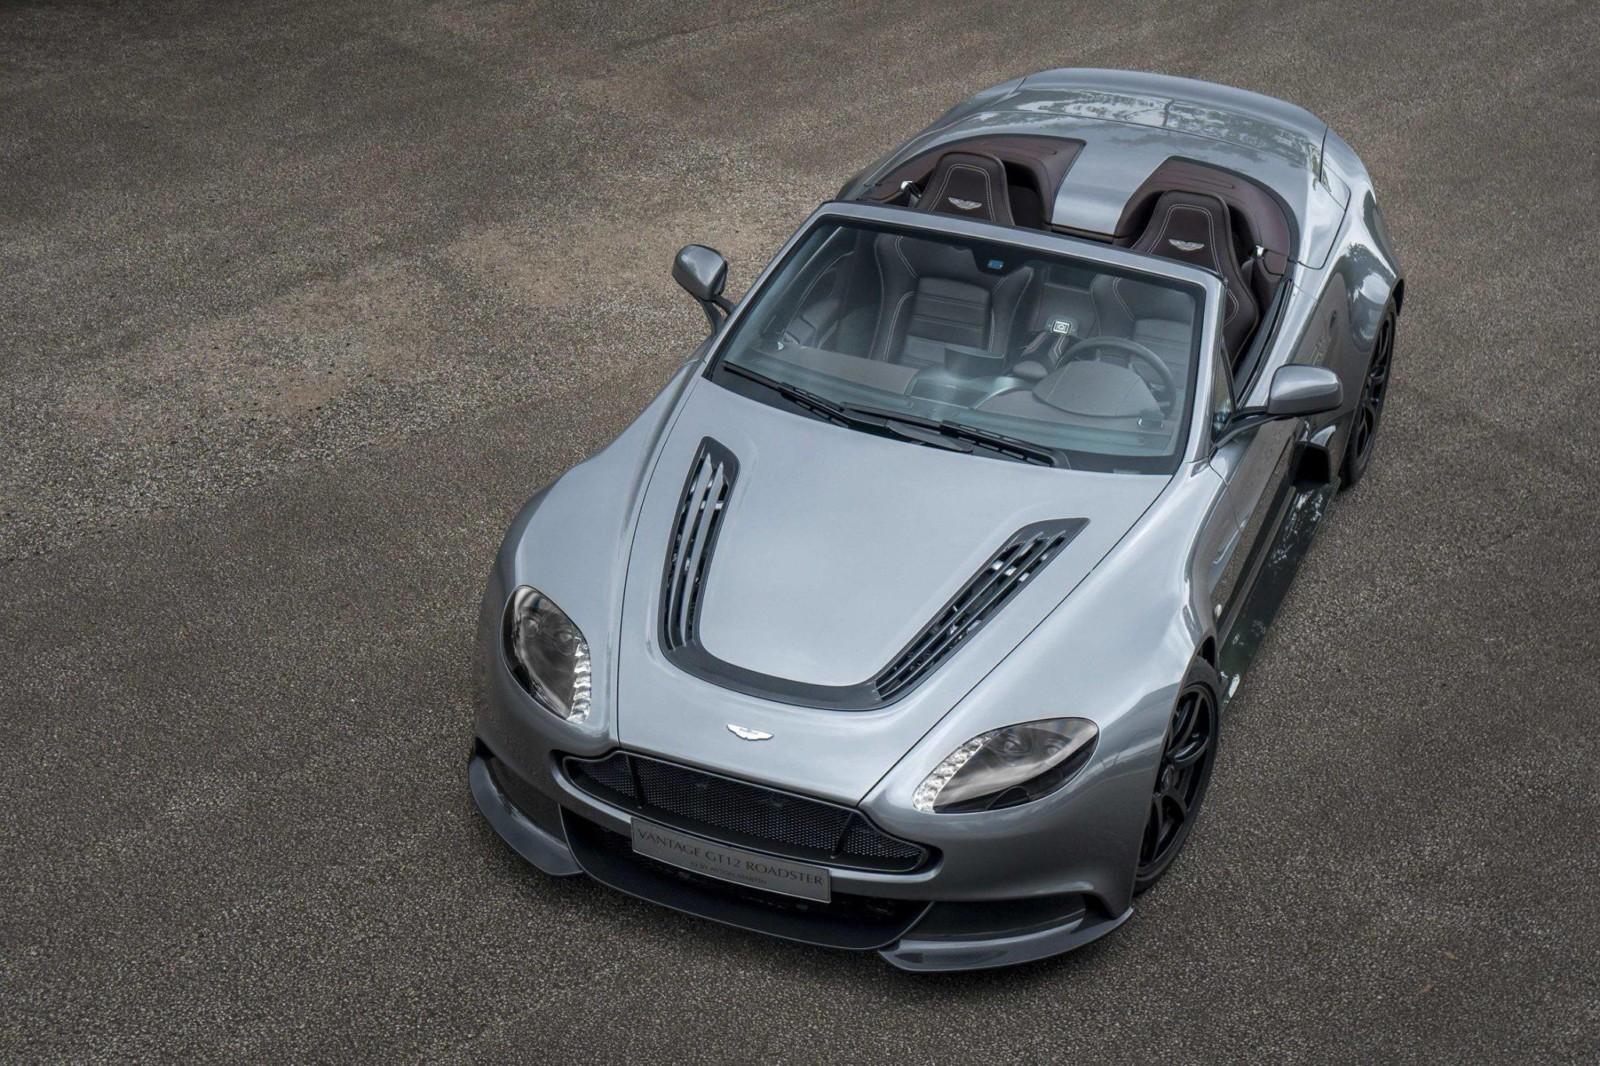 Aston_Martin_Vantage_GT12_roadster